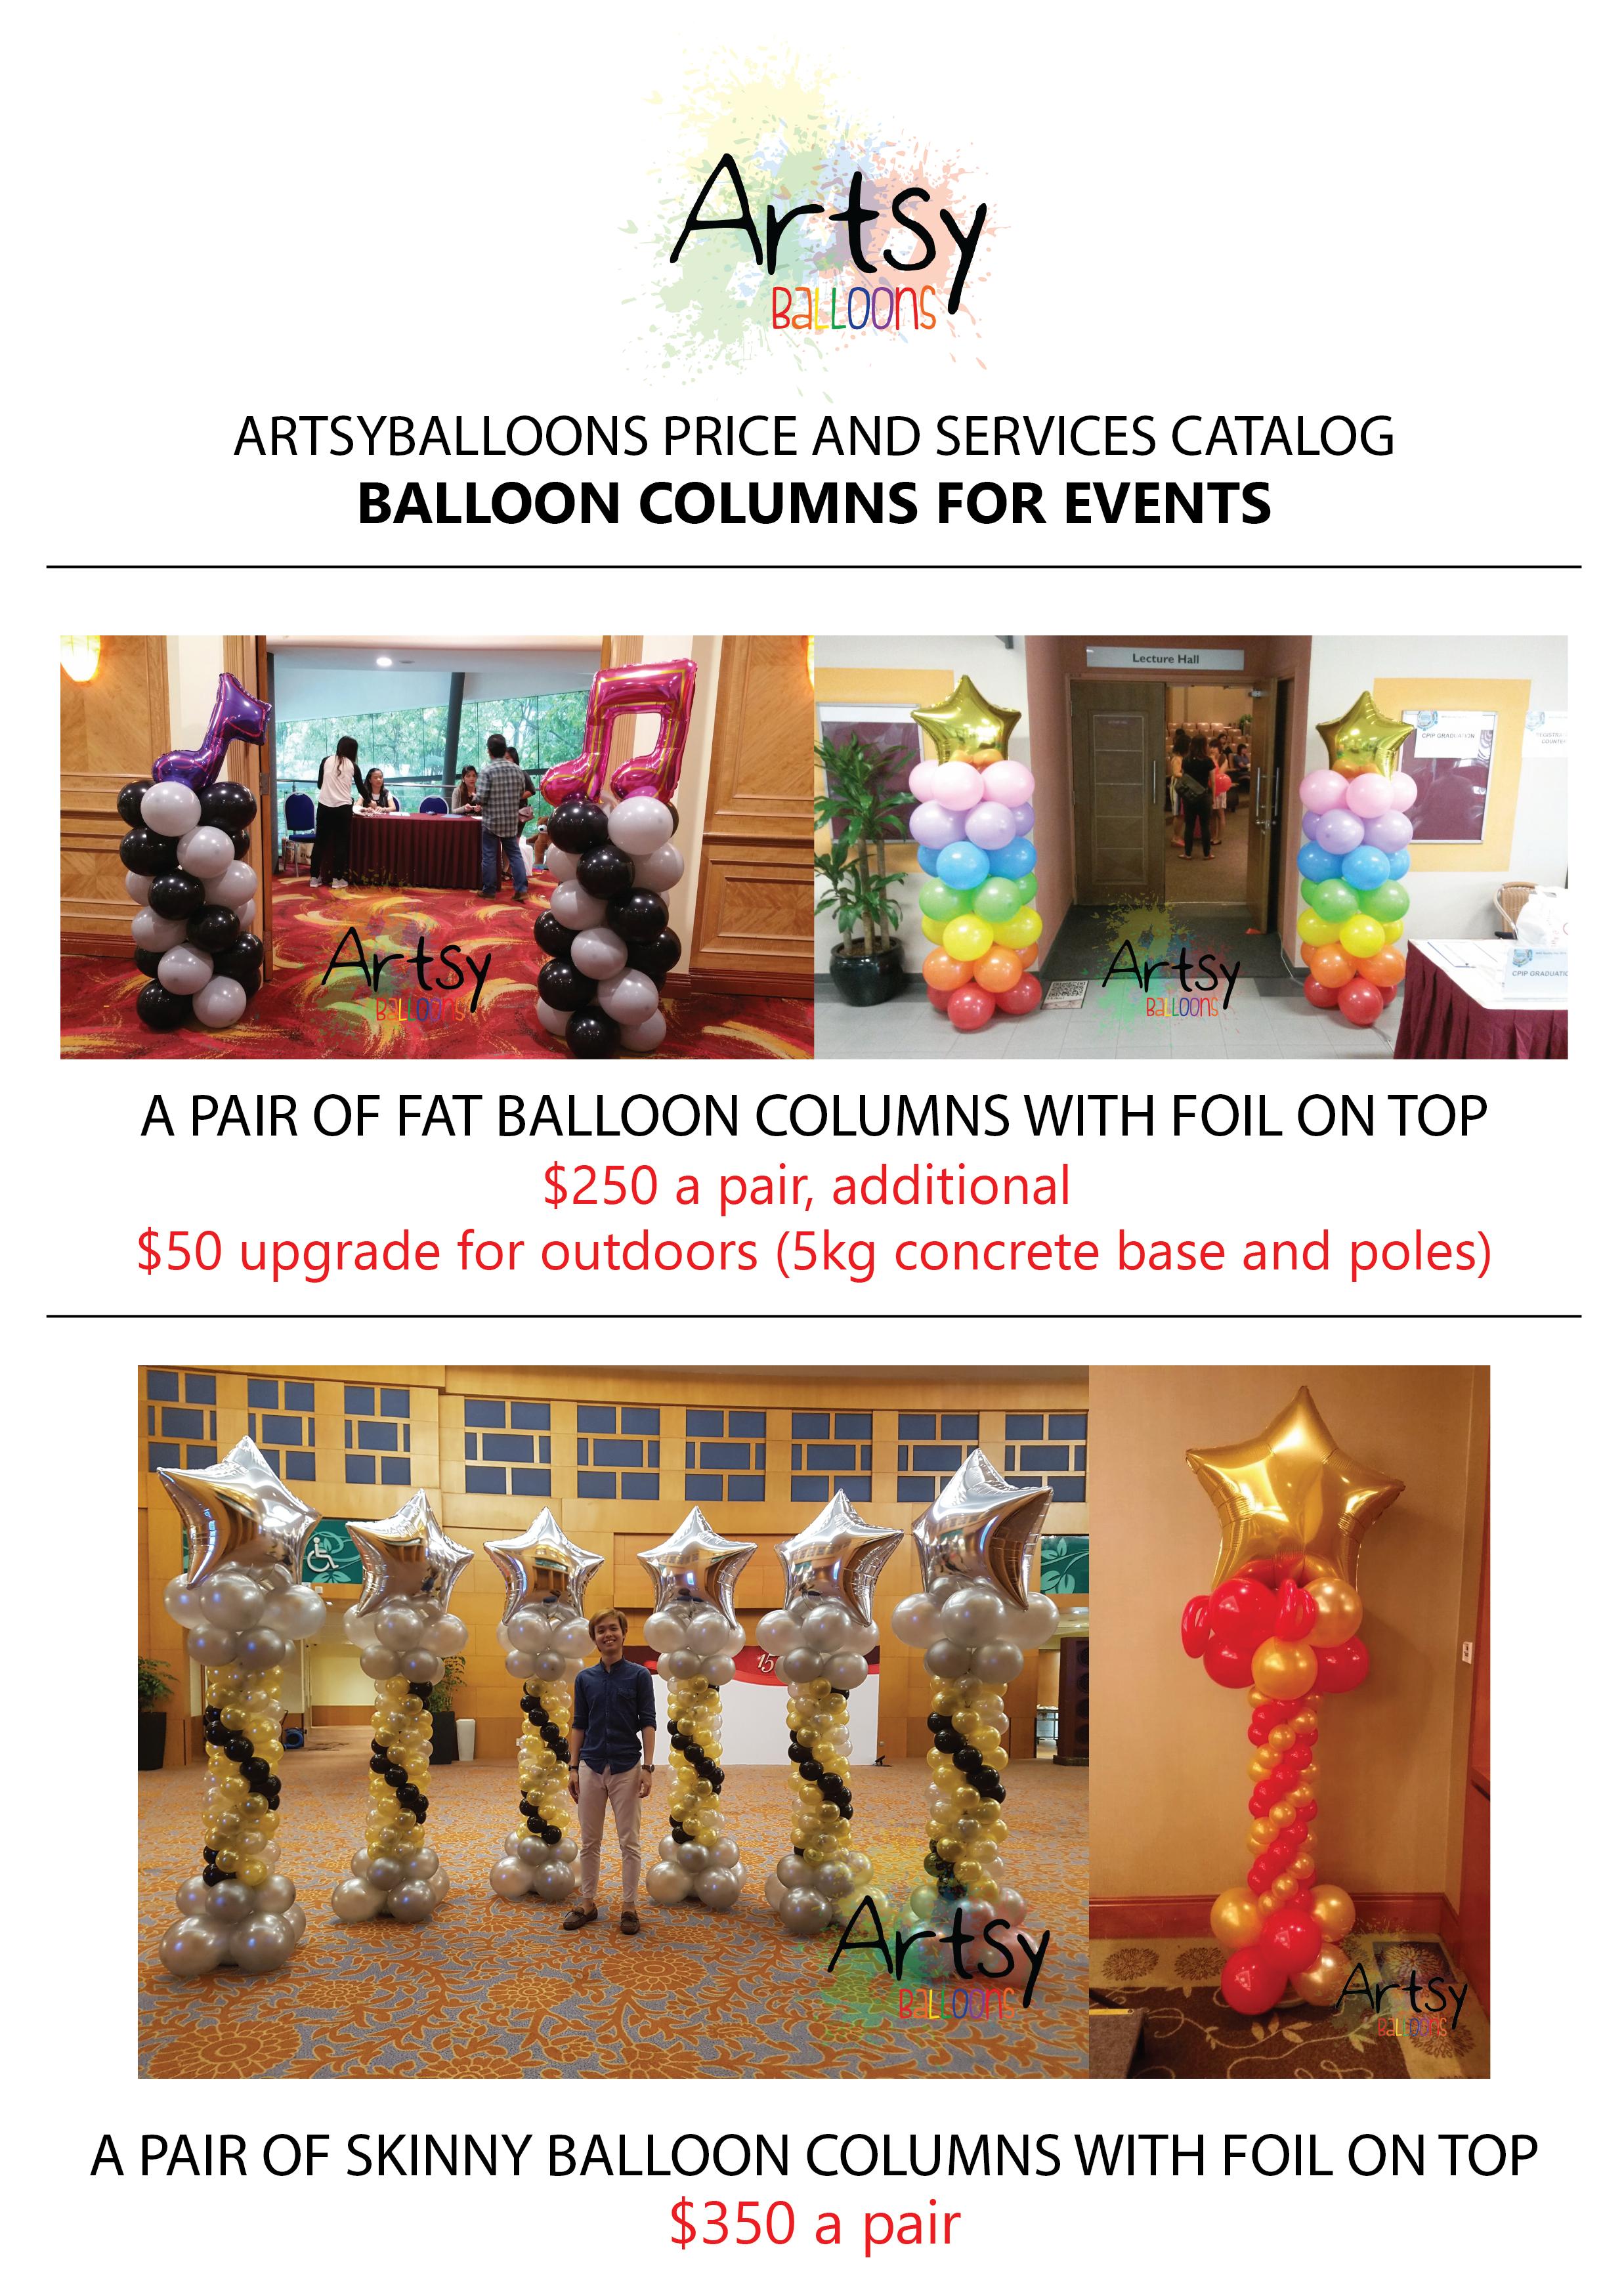 , 2018 Artsyballoons service catalog, Singapore Balloon Decoration Services - Balloon Workshop and Balloon Sculpting